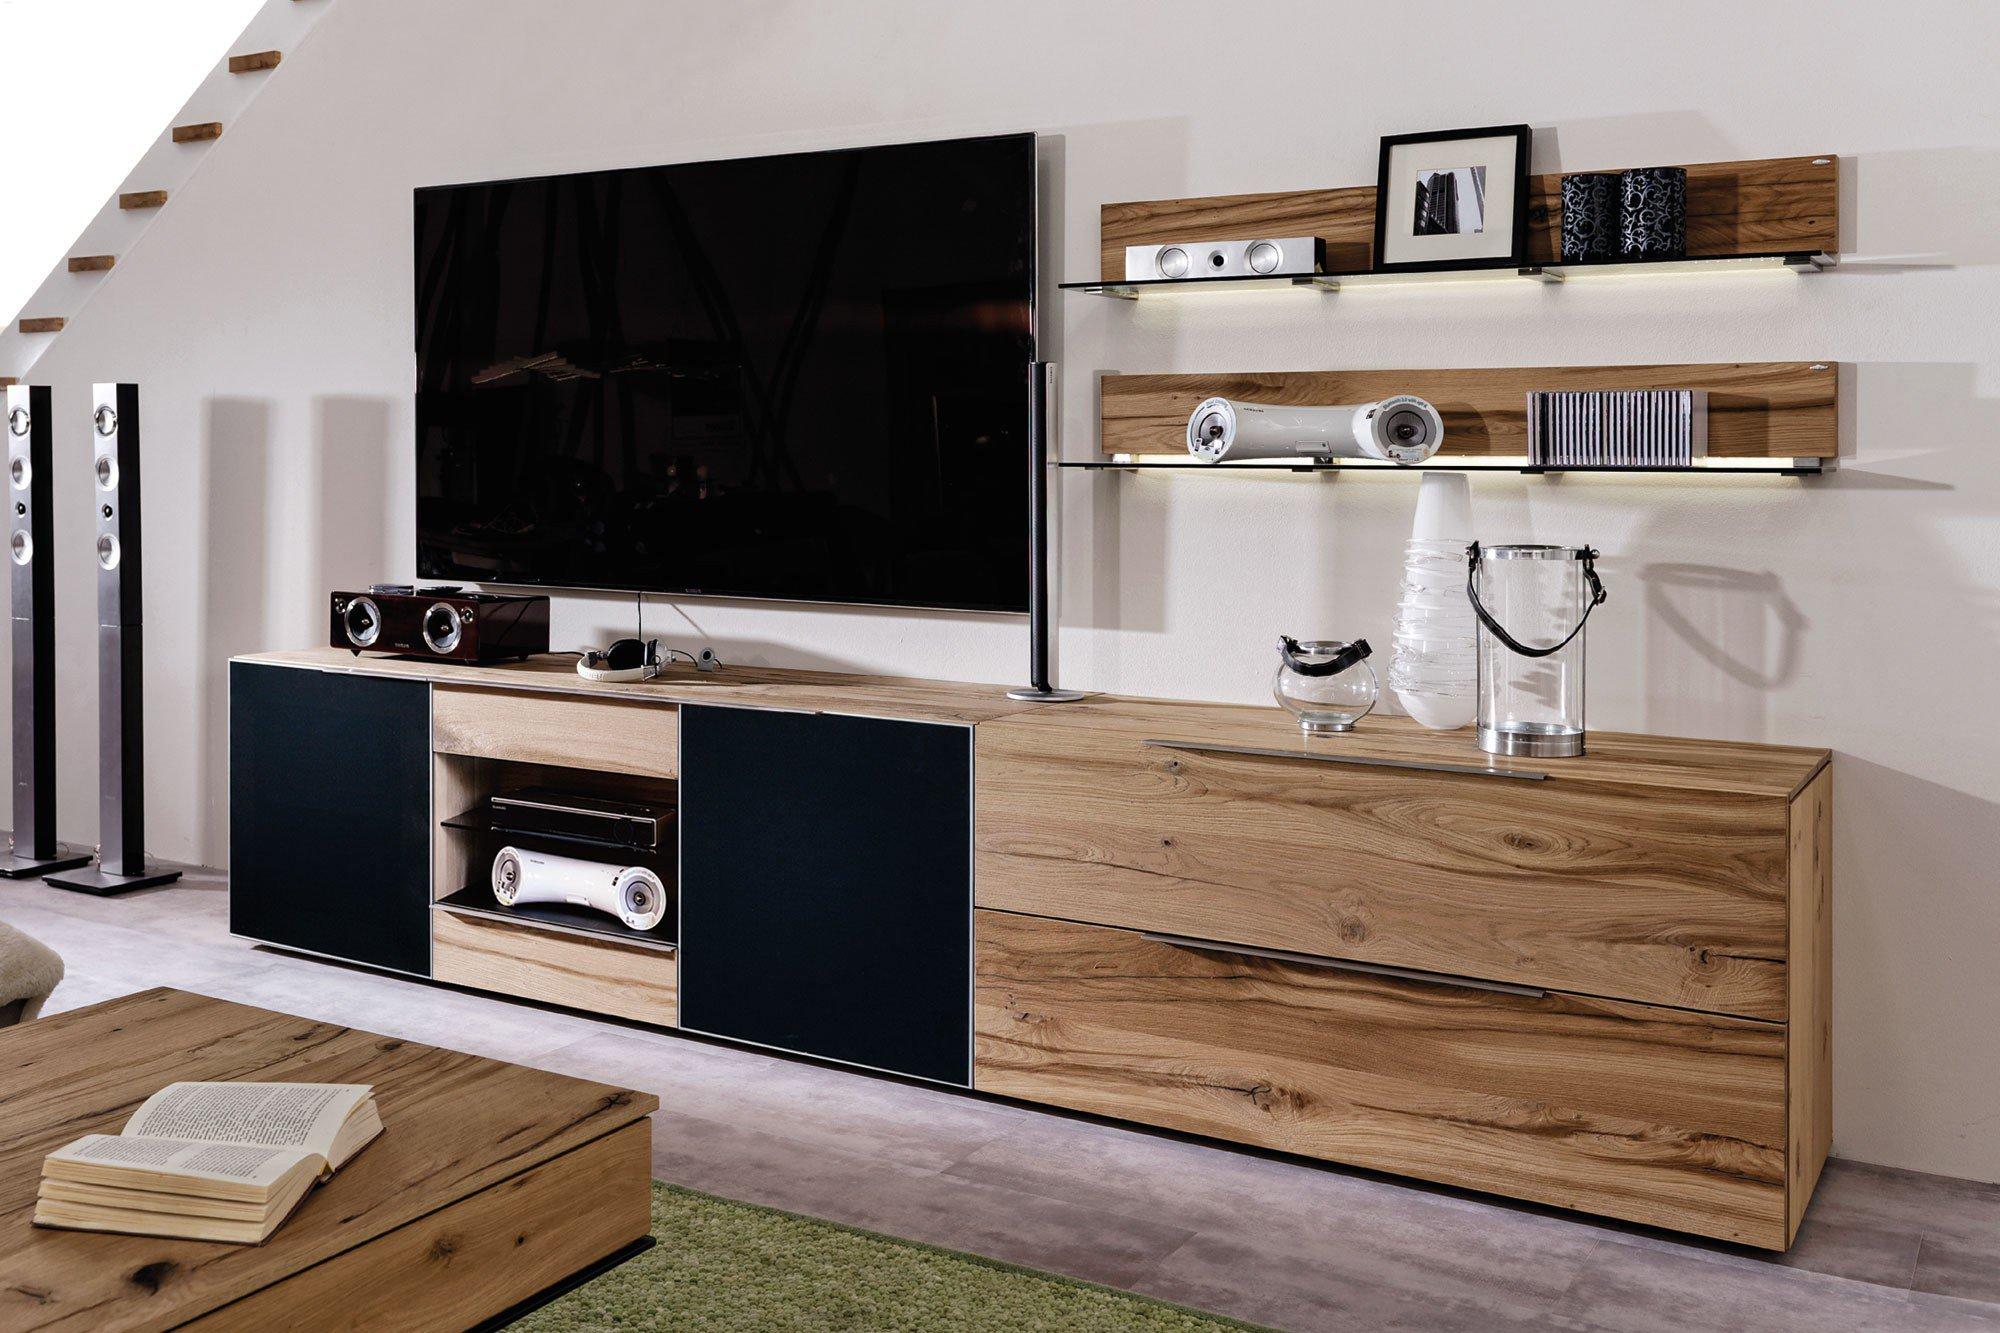 voglauer wohnwand v alpin eiche altholz akustikstoff. Black Bedroom Furniture Sets. Home Design Ideas